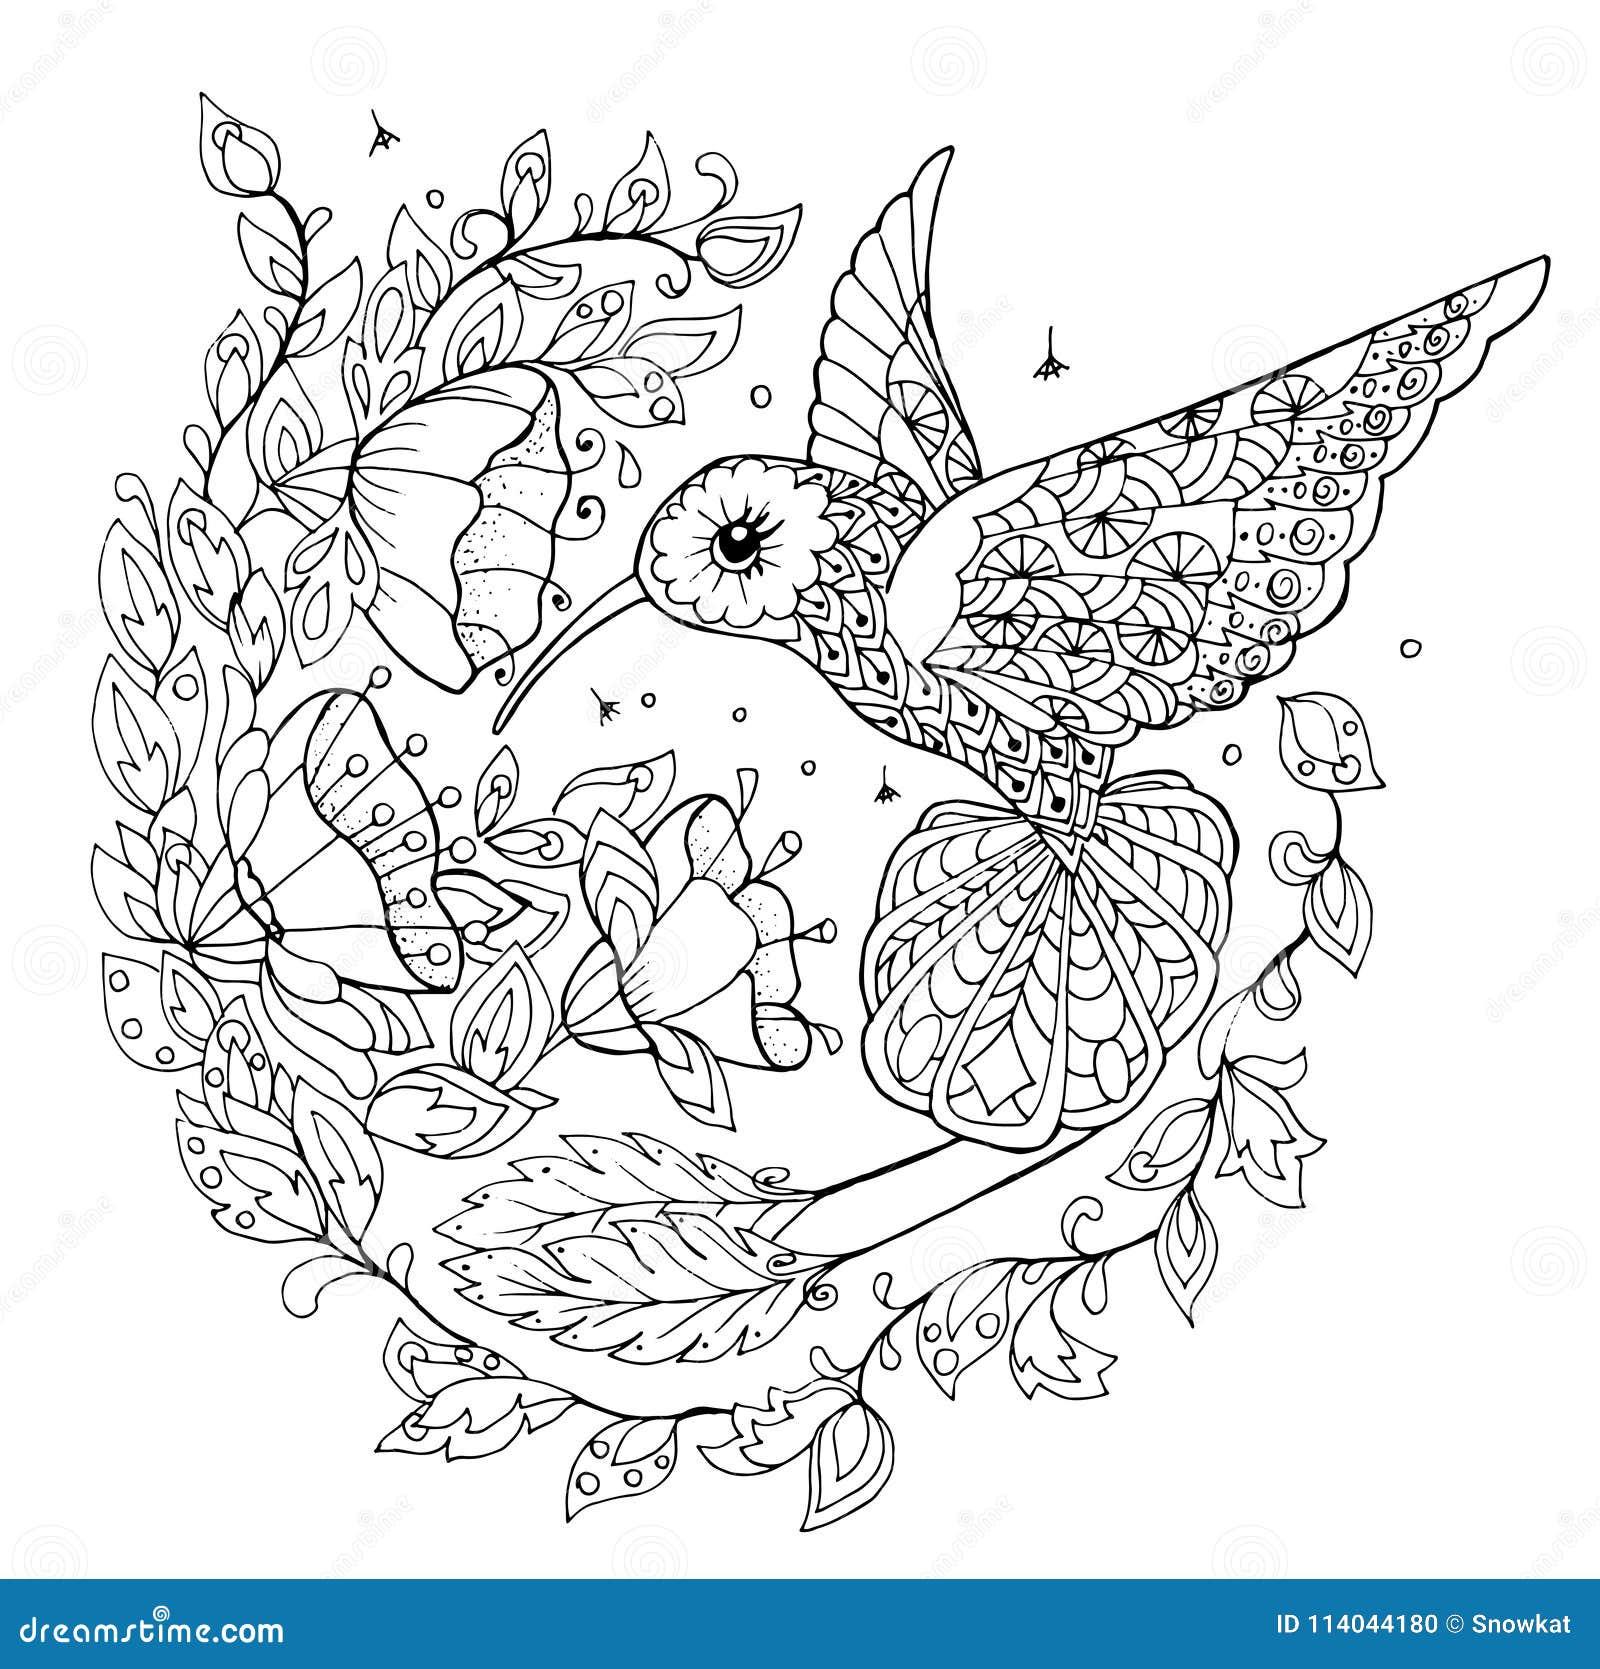 Hummingbird coloring book stock vector. Illustration of ...